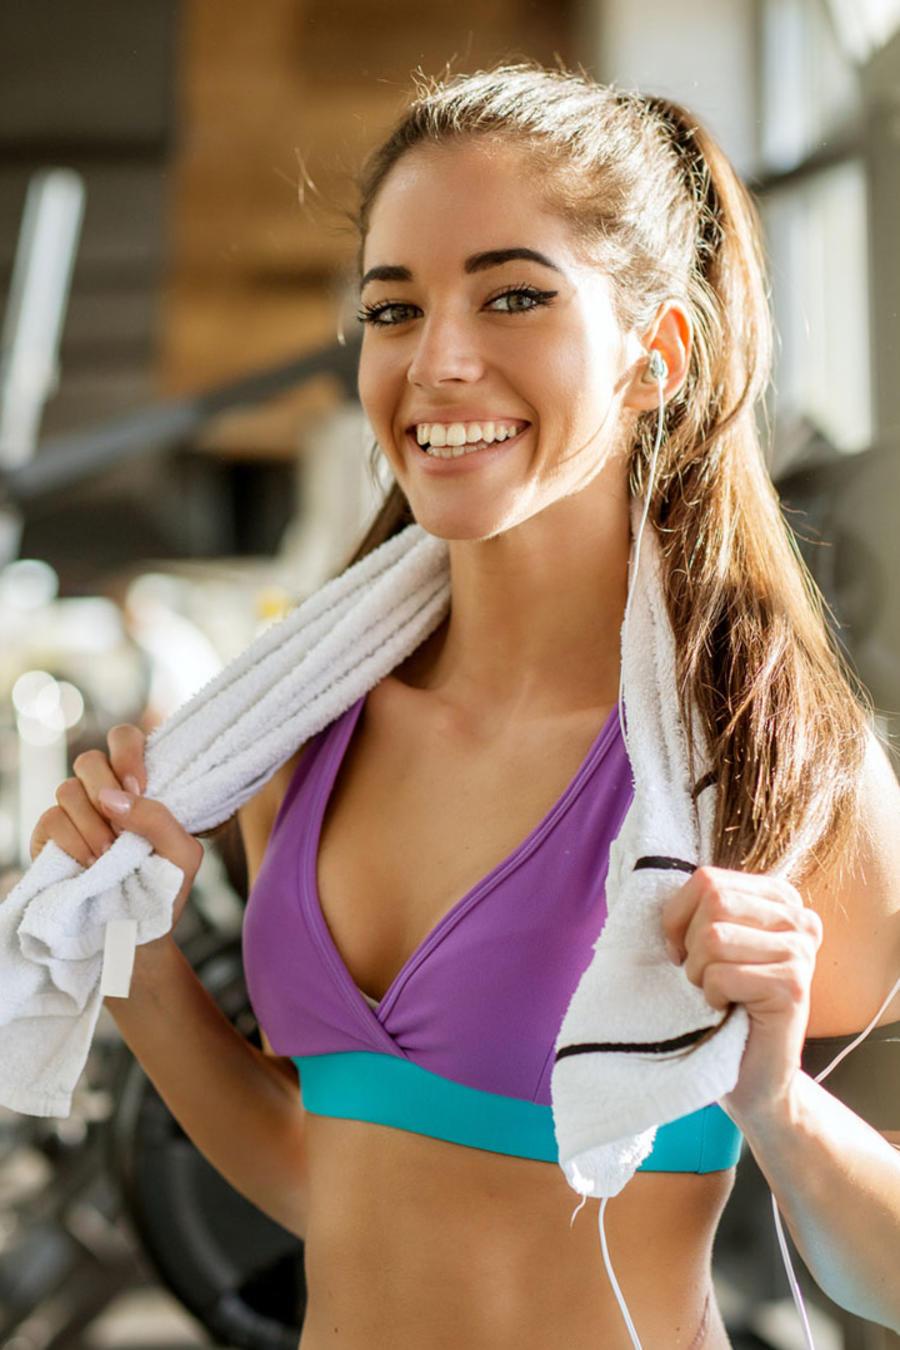 Mujer hispana en el gimnasio